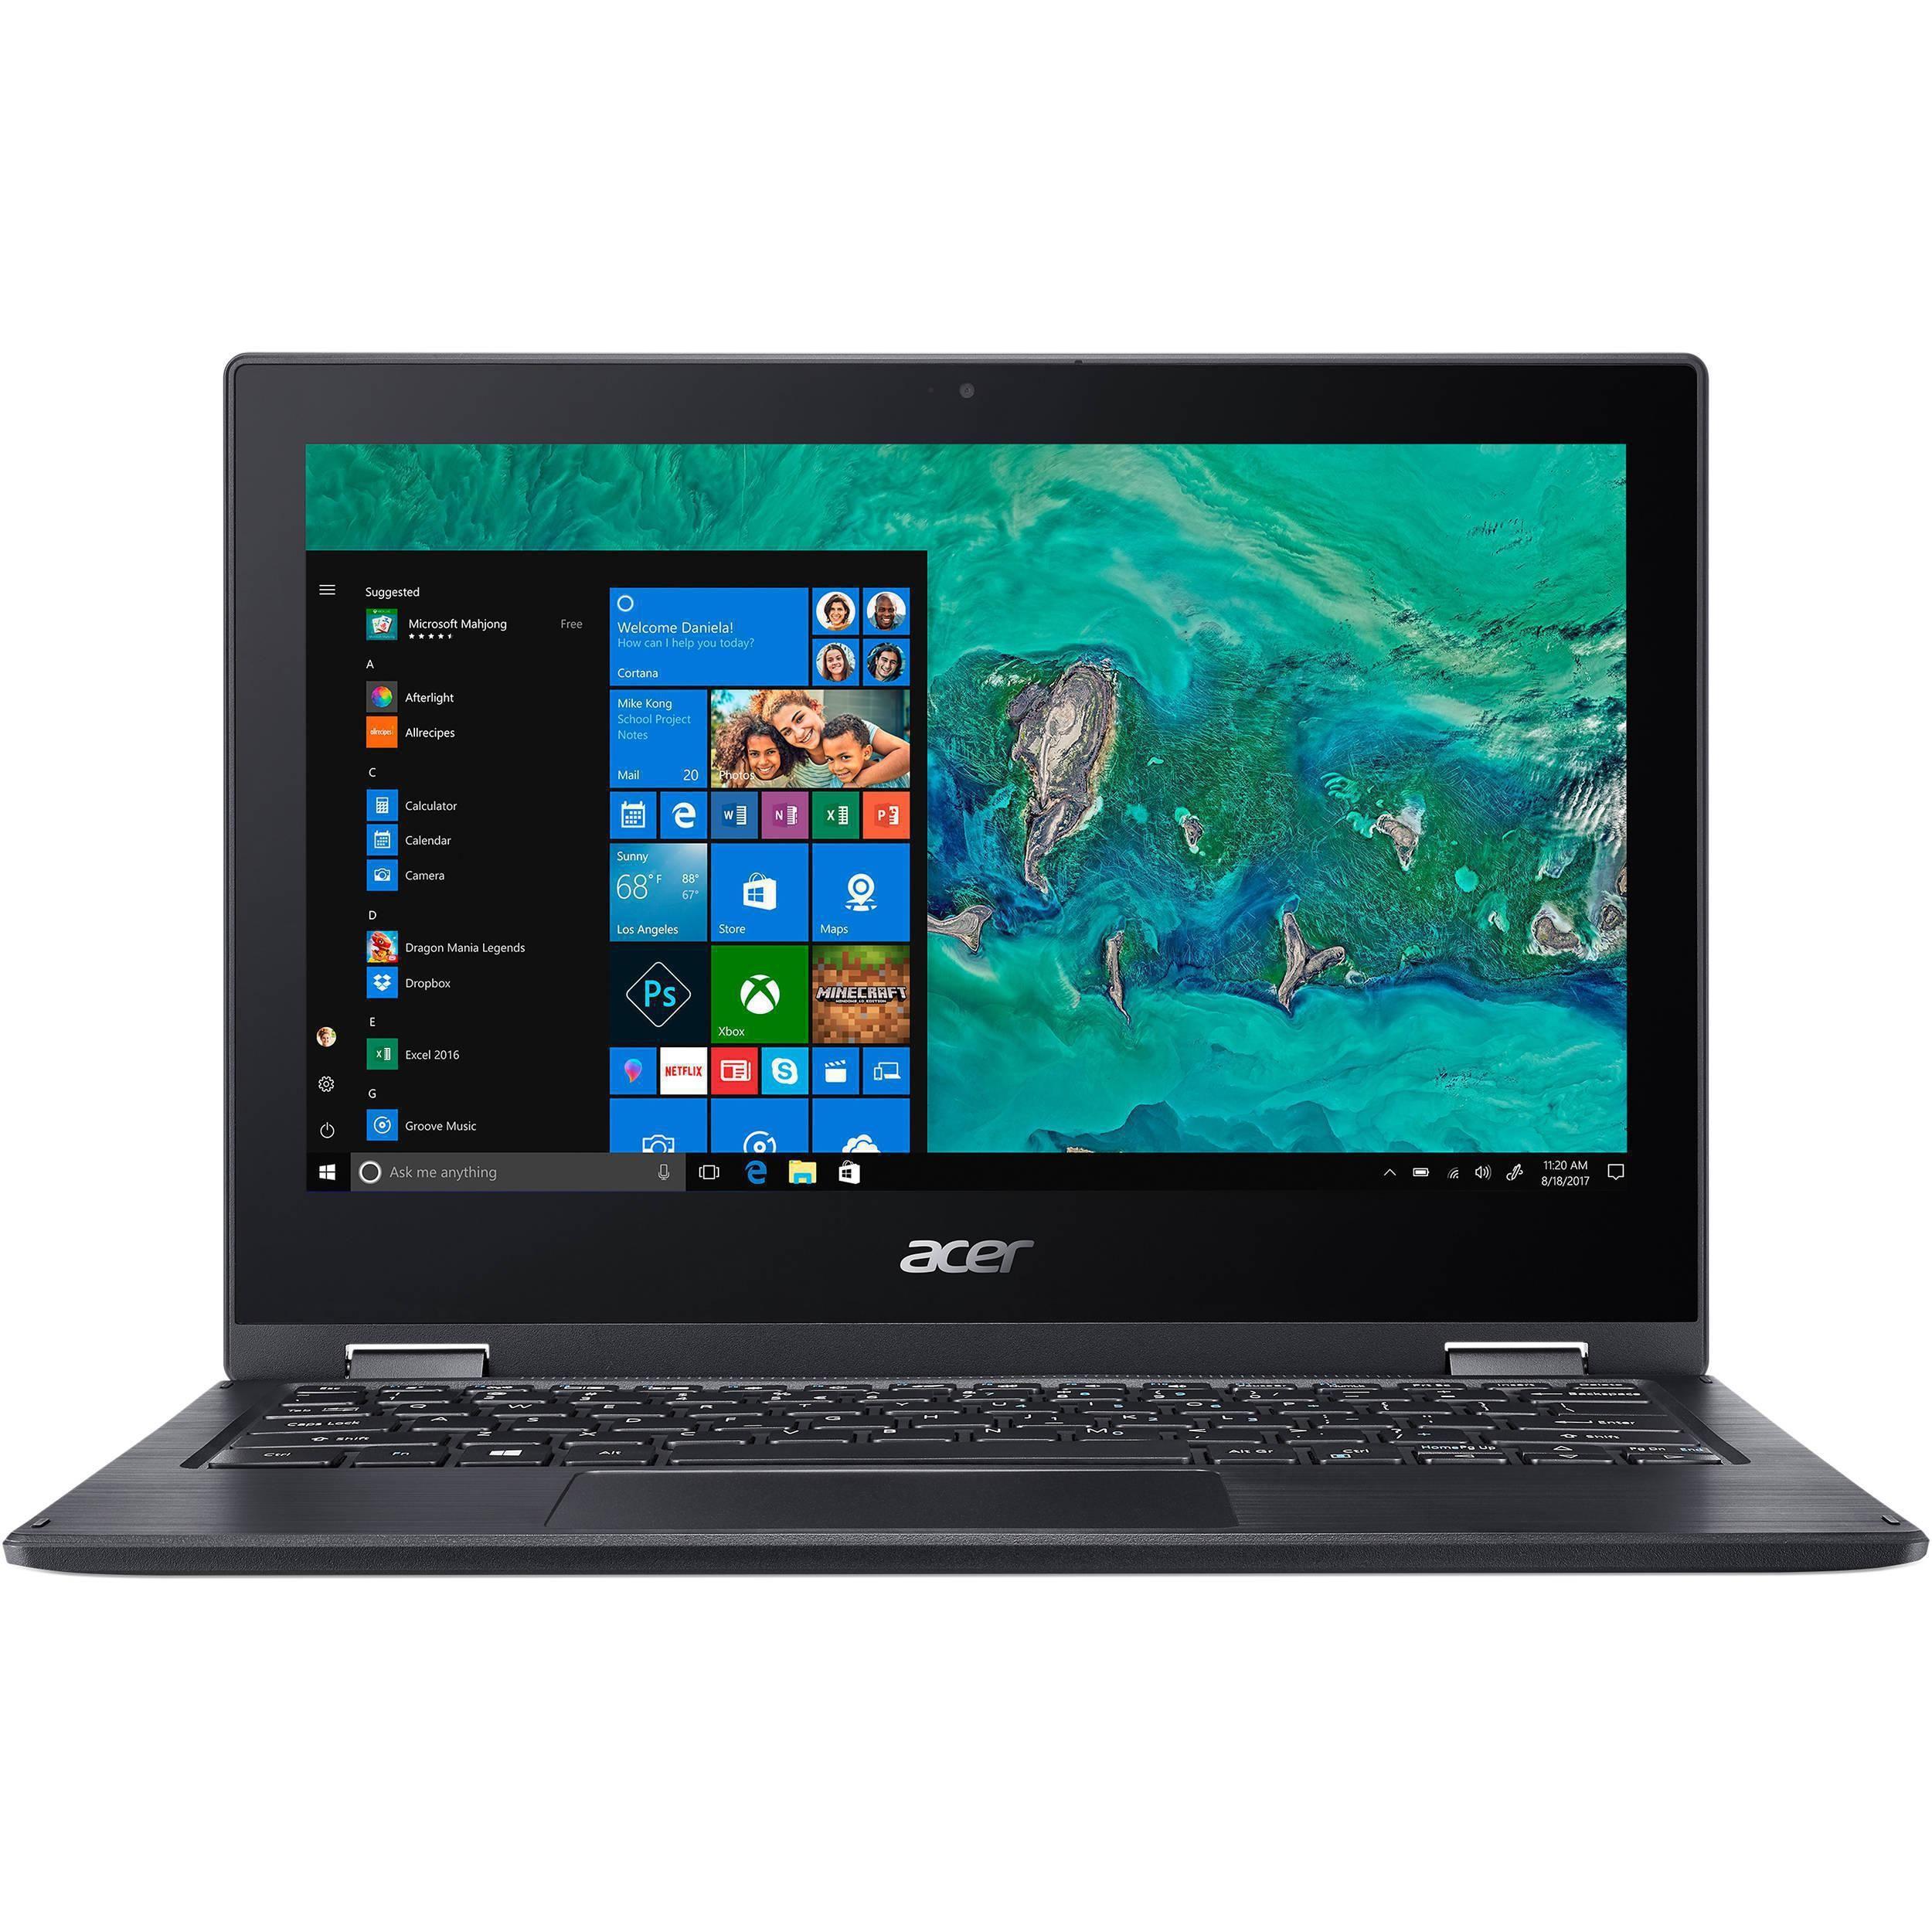 Acer Spin 1 11 2018 Pentium N5000 Ram 4 Gb Ssd 64 Gb